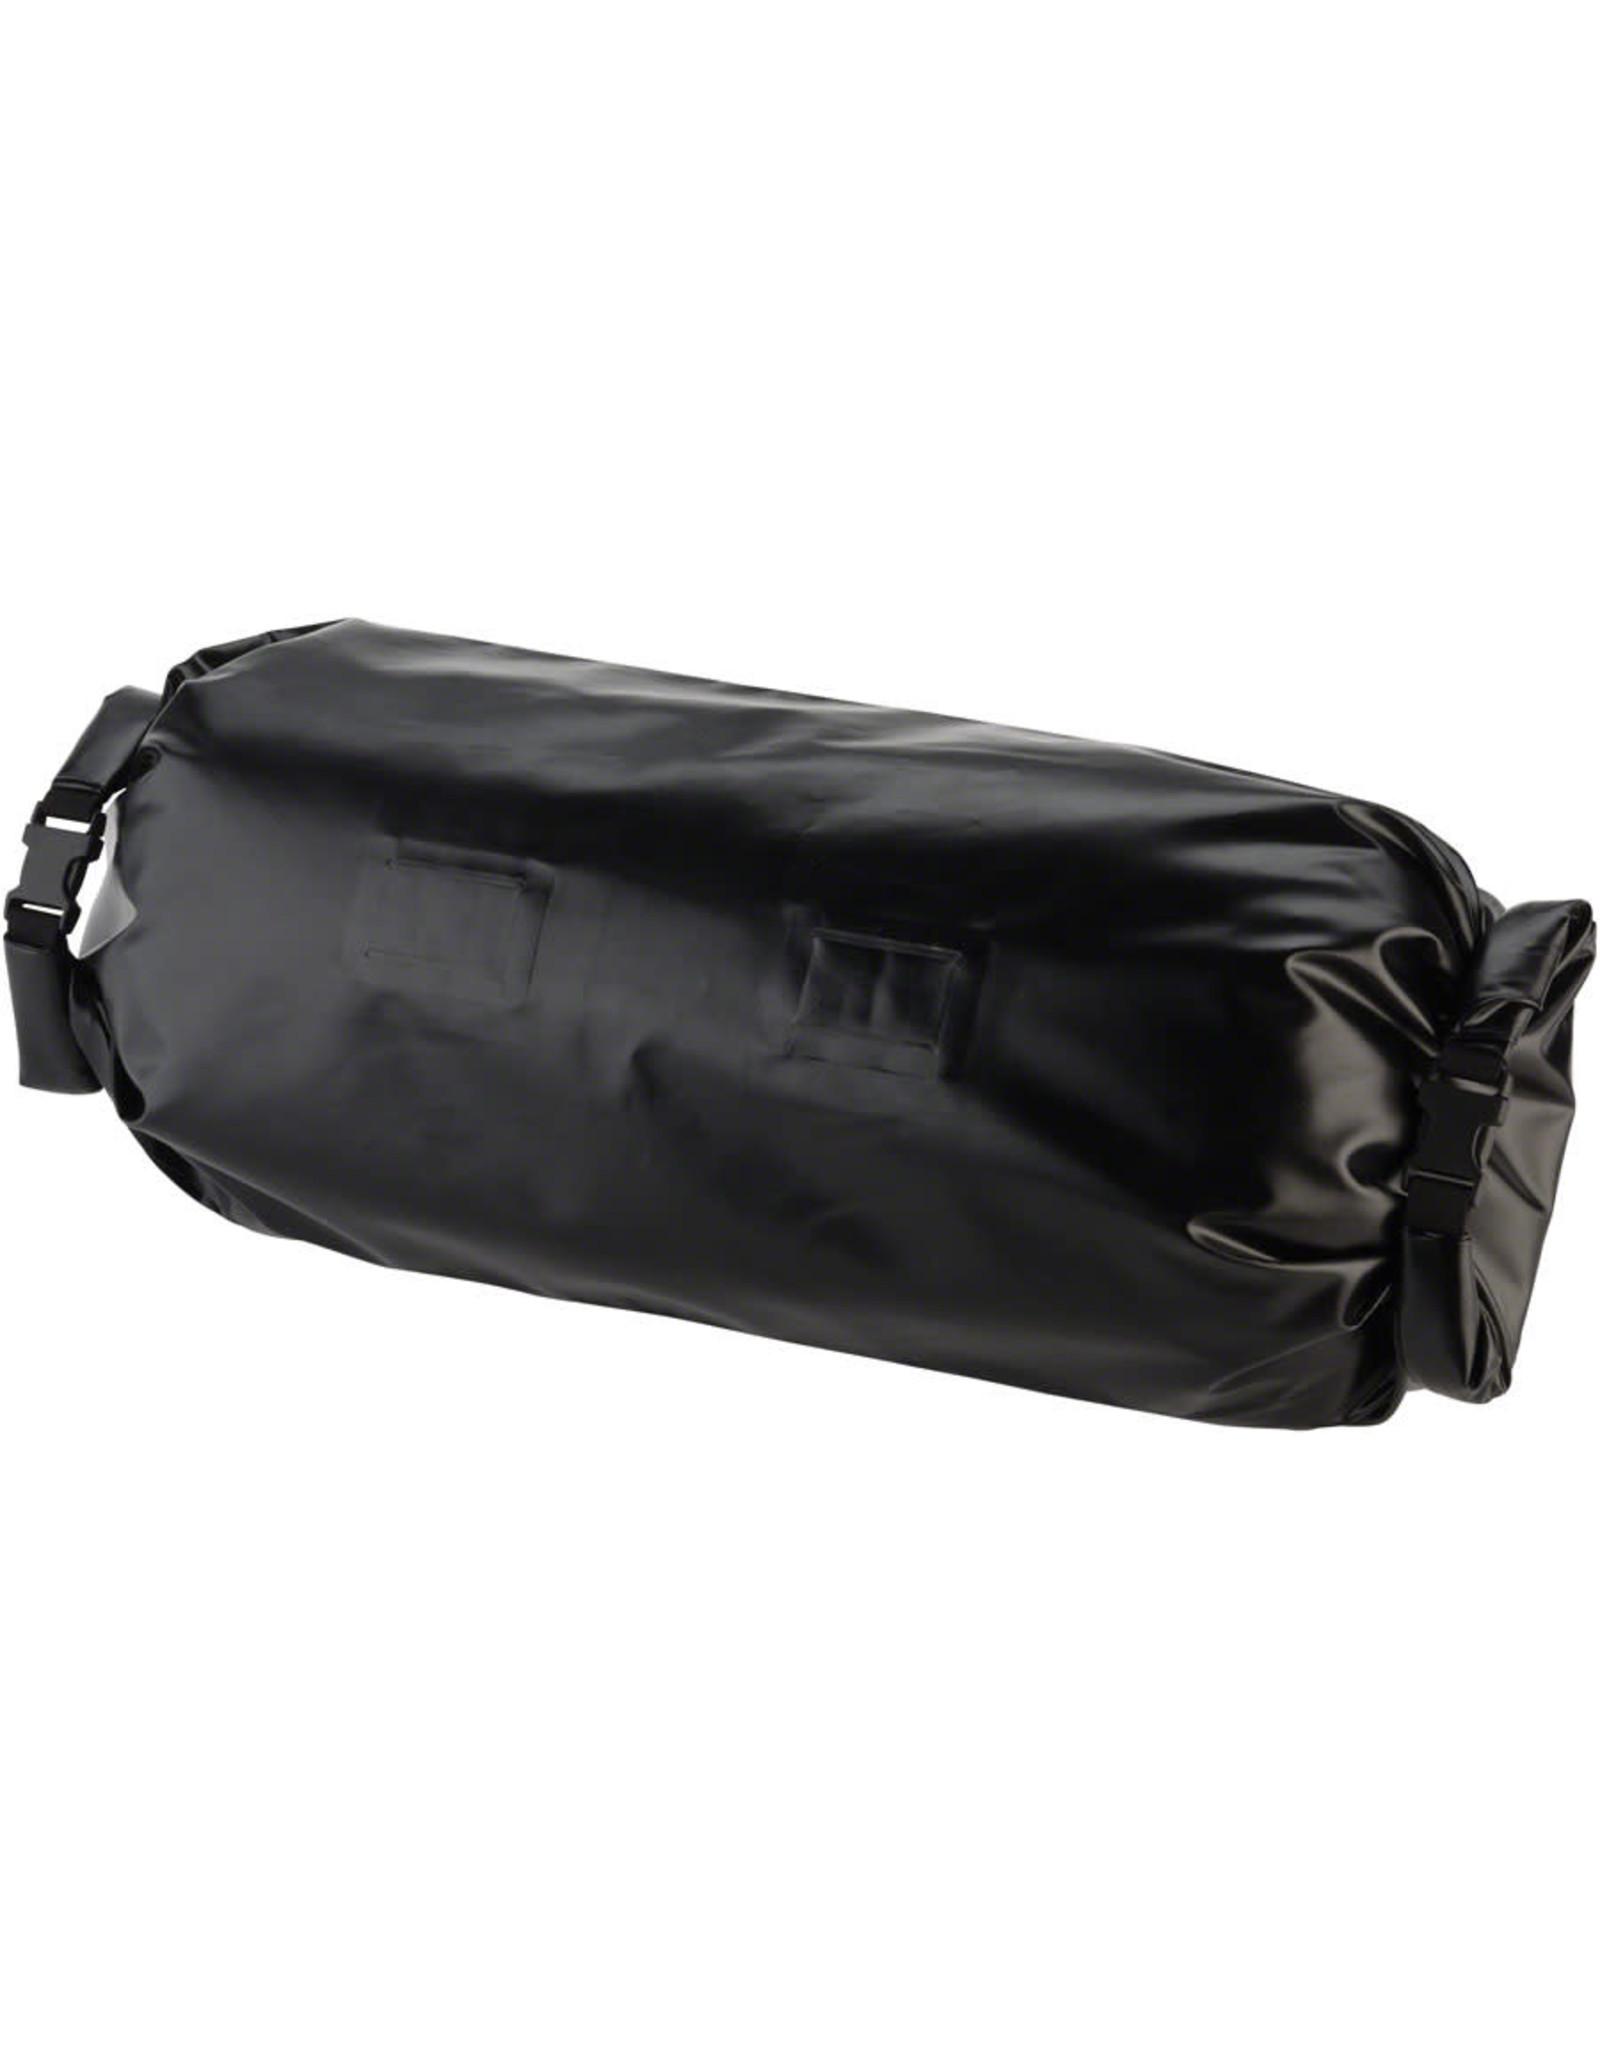 Salsa Cycles Salsa EXP Series Anything Cradle 15 Liter Dry Bag